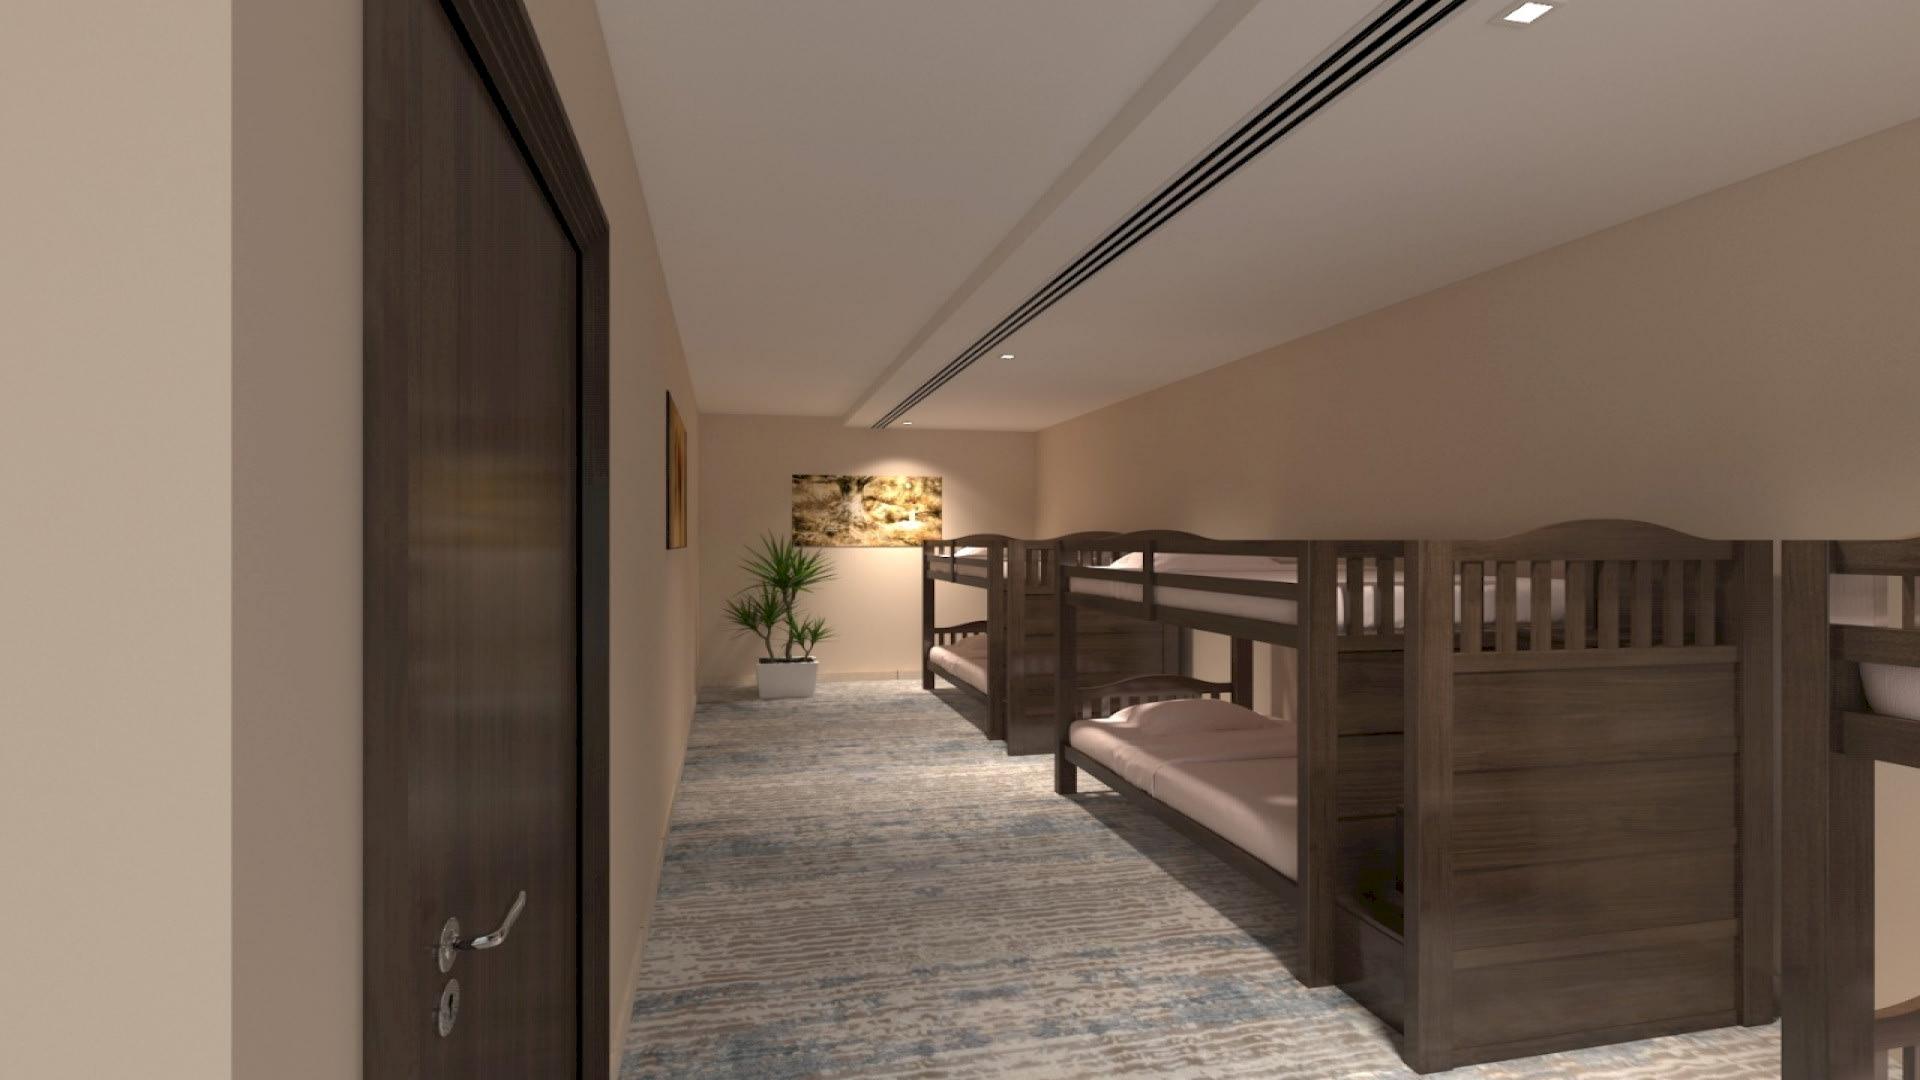 HOSTEL - The 7 Hostels